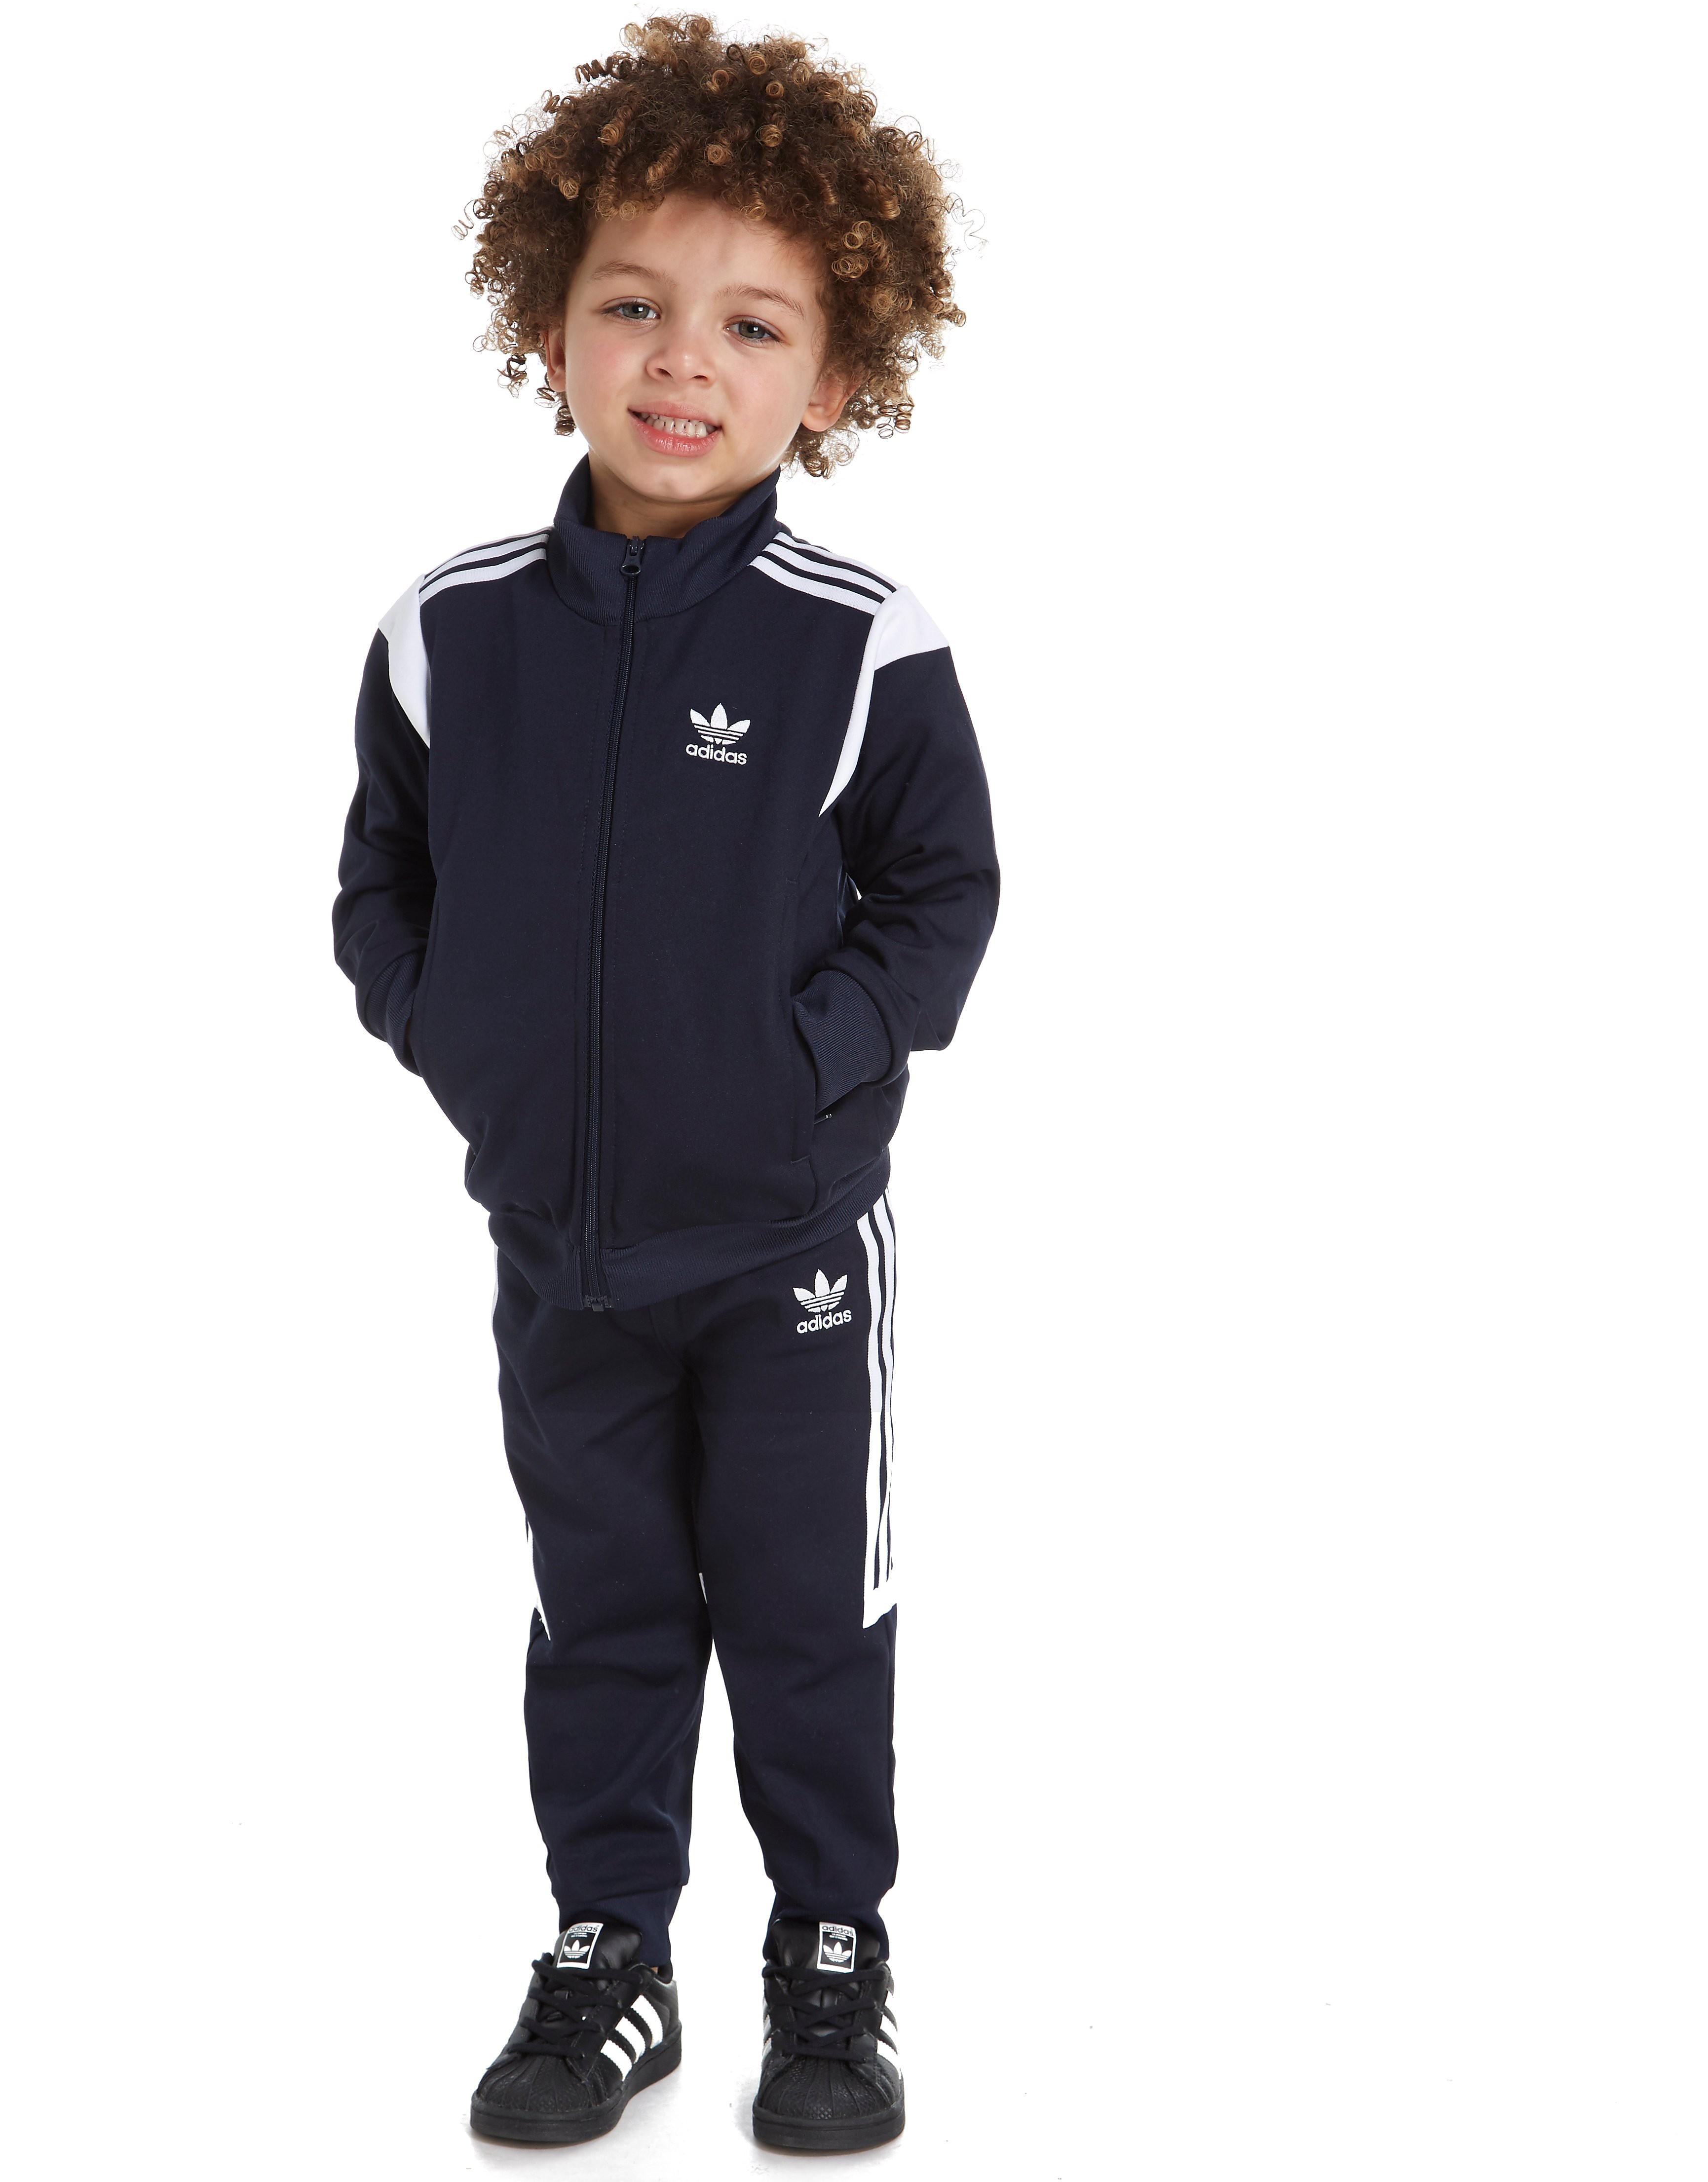 adidas Originals Challenger Suit Infant